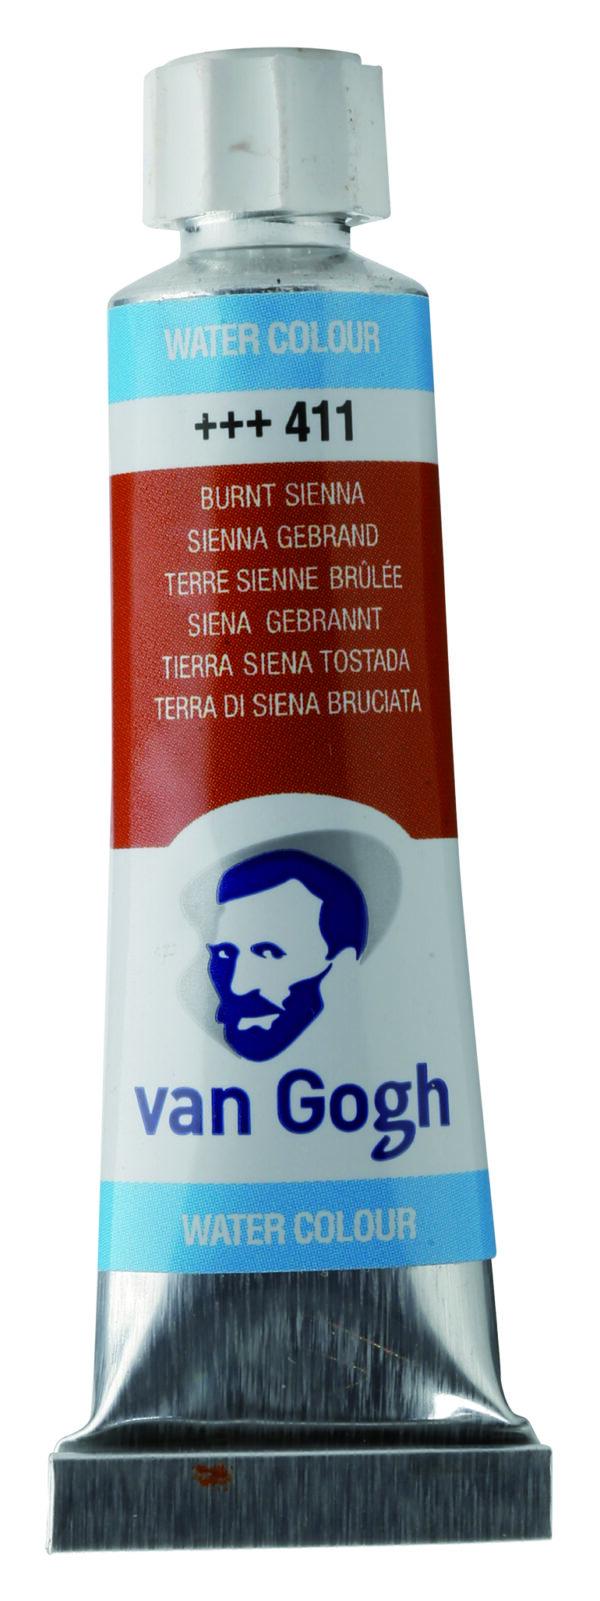 Van Gogh 411 Burnt sienna - 10 ml